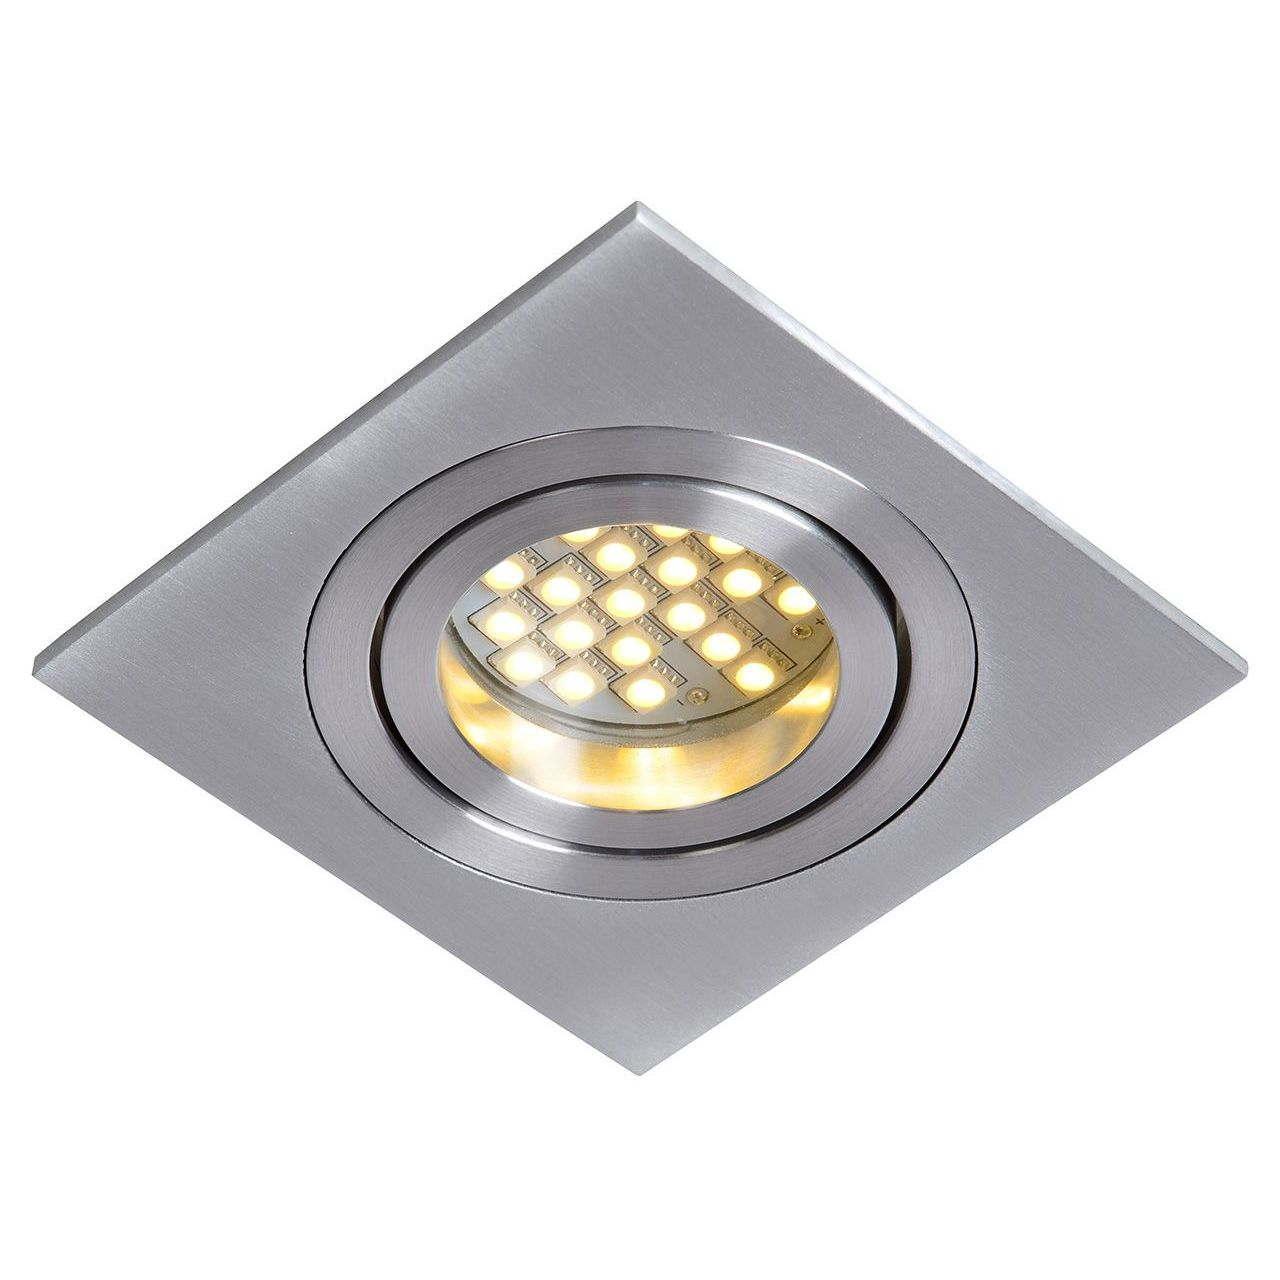 цена на Встраиваемый светильник Lucide Tube 22955/01/12